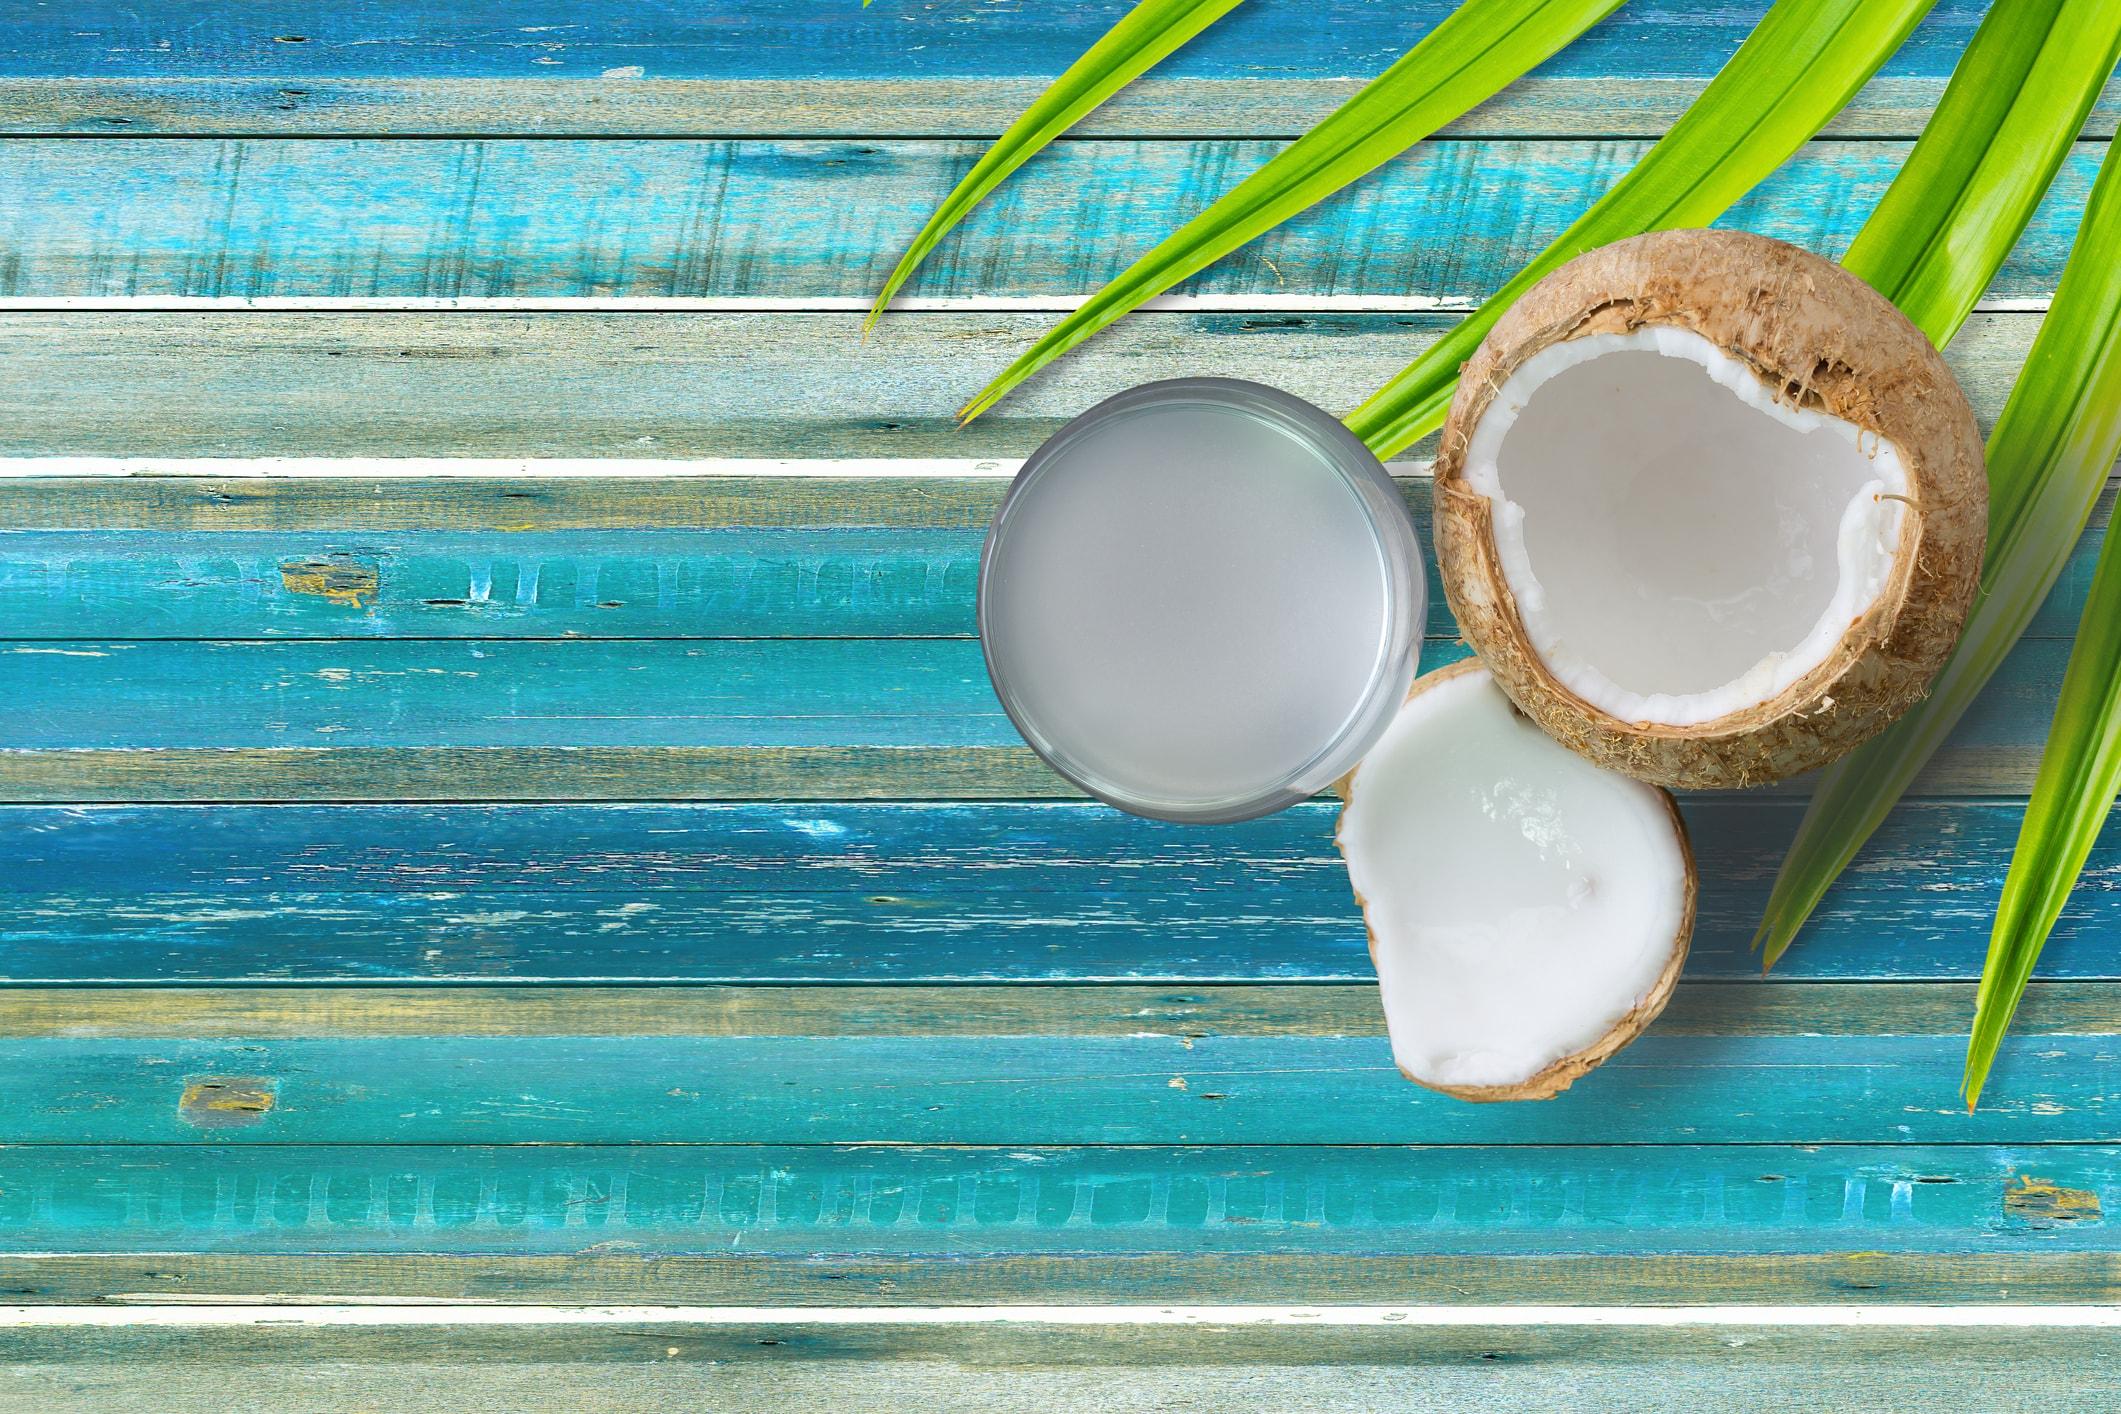 Kokosöl hilft gegen trockene Füße